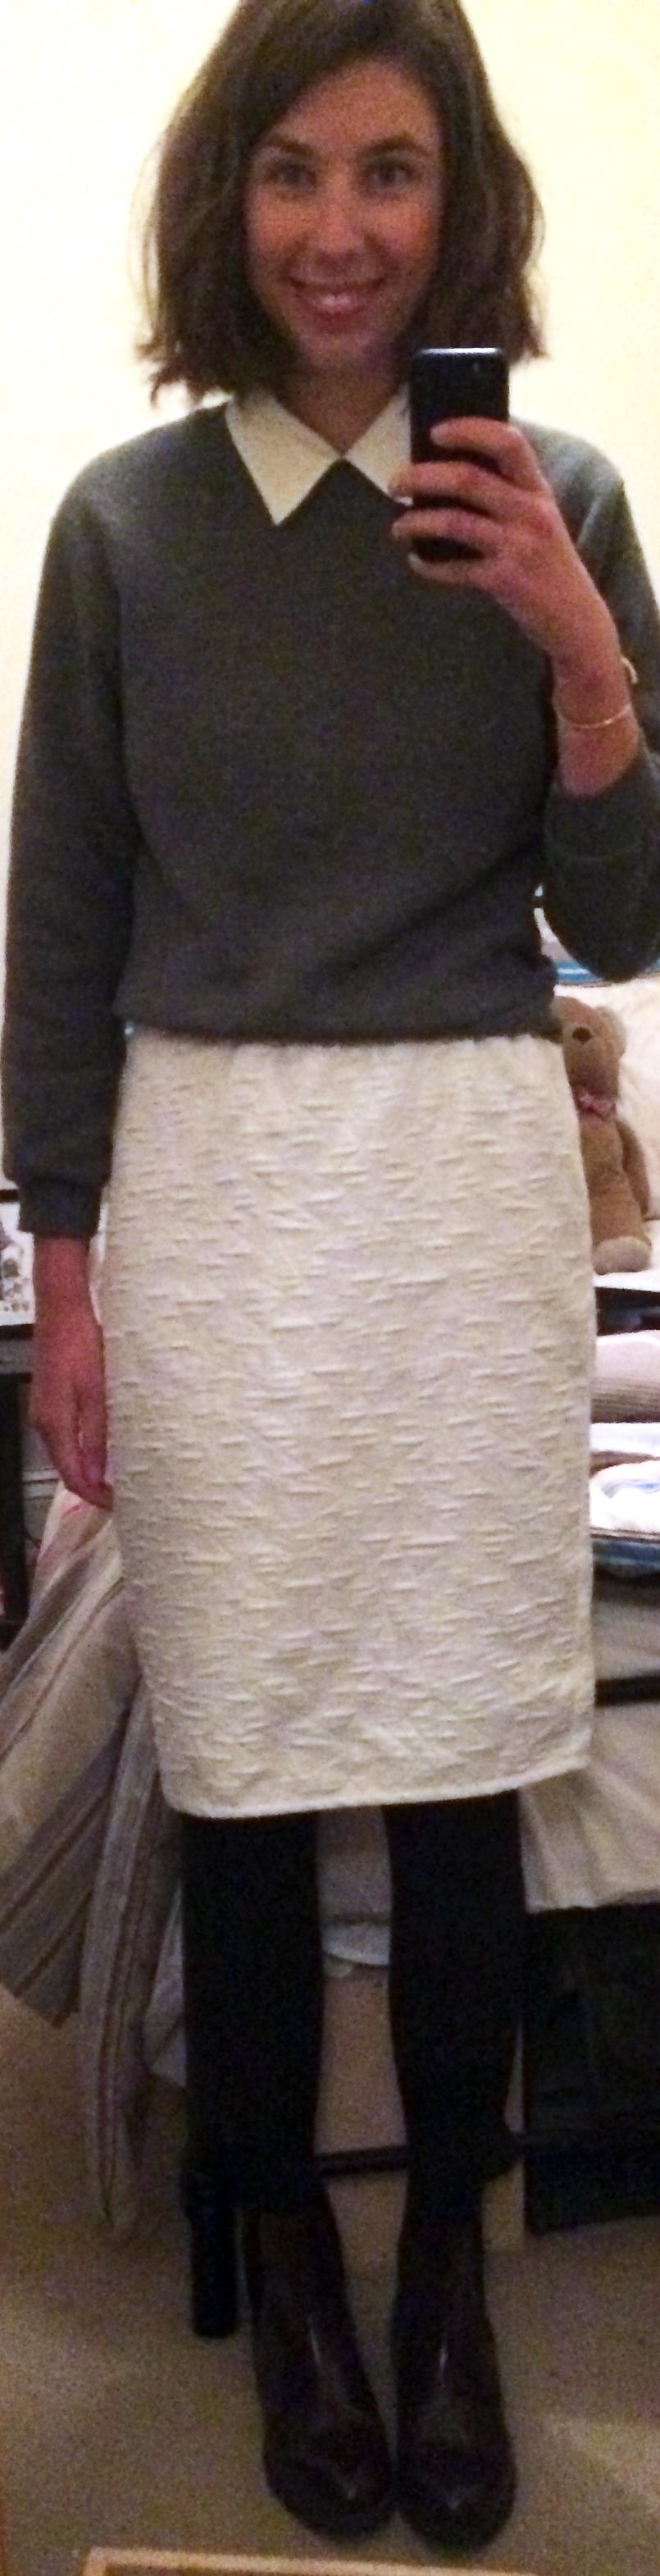 Thrifted Kids Sweatshirt,  White Skirt ,  White Button-Down Shirt ,  Black Knit Tights ,  Burgundy Chelsea Boots ,  Brass Cuff